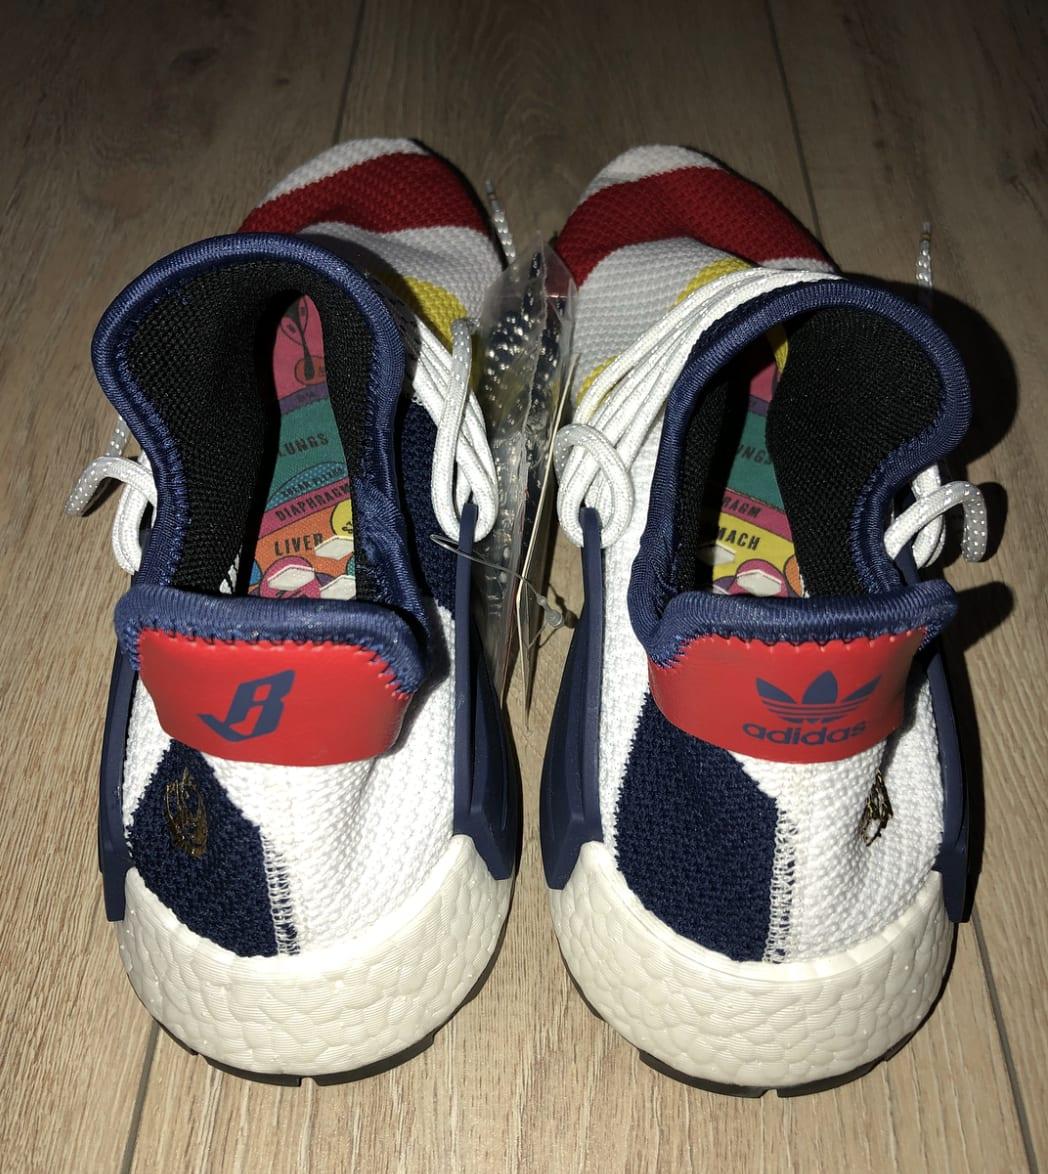 Pharrell x Adidas NMD HU 'BBC' 8